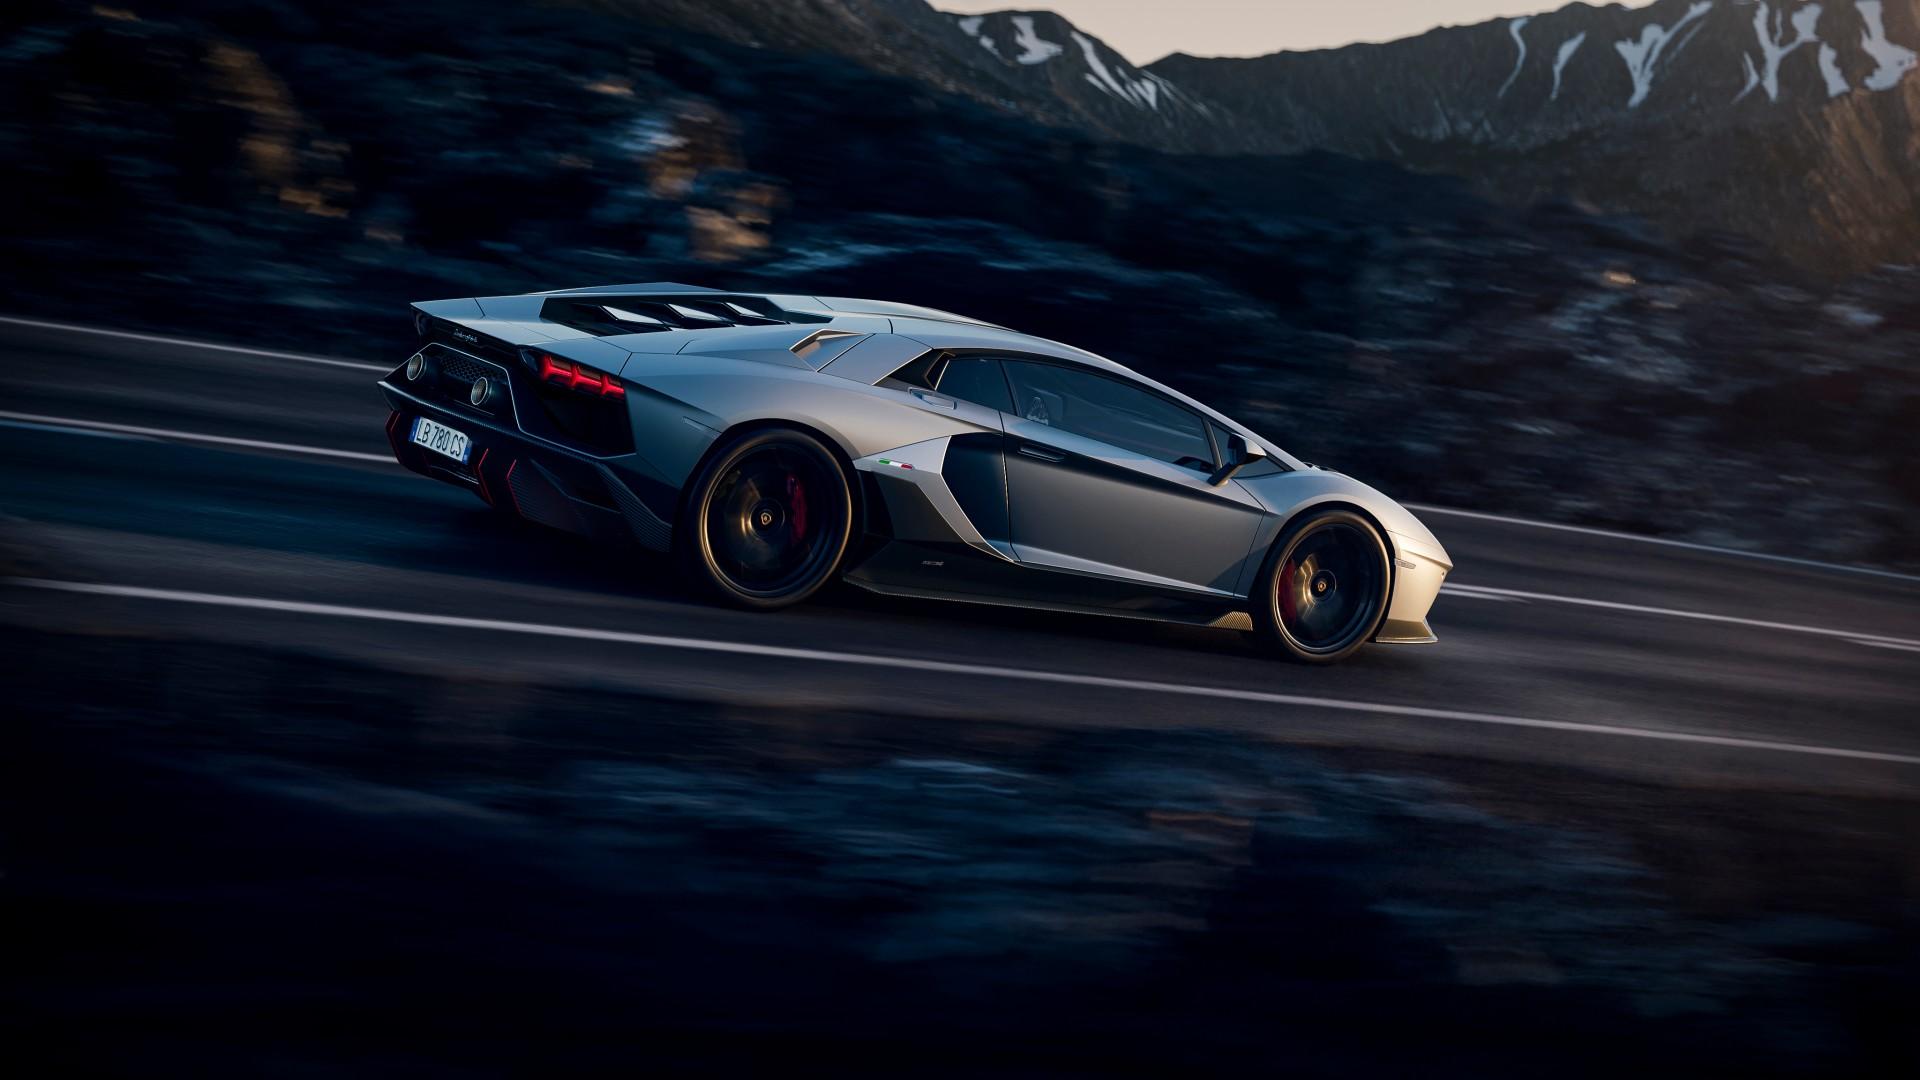 Lamborghini Aventador LP780 4 Ultimae 2022 (9)